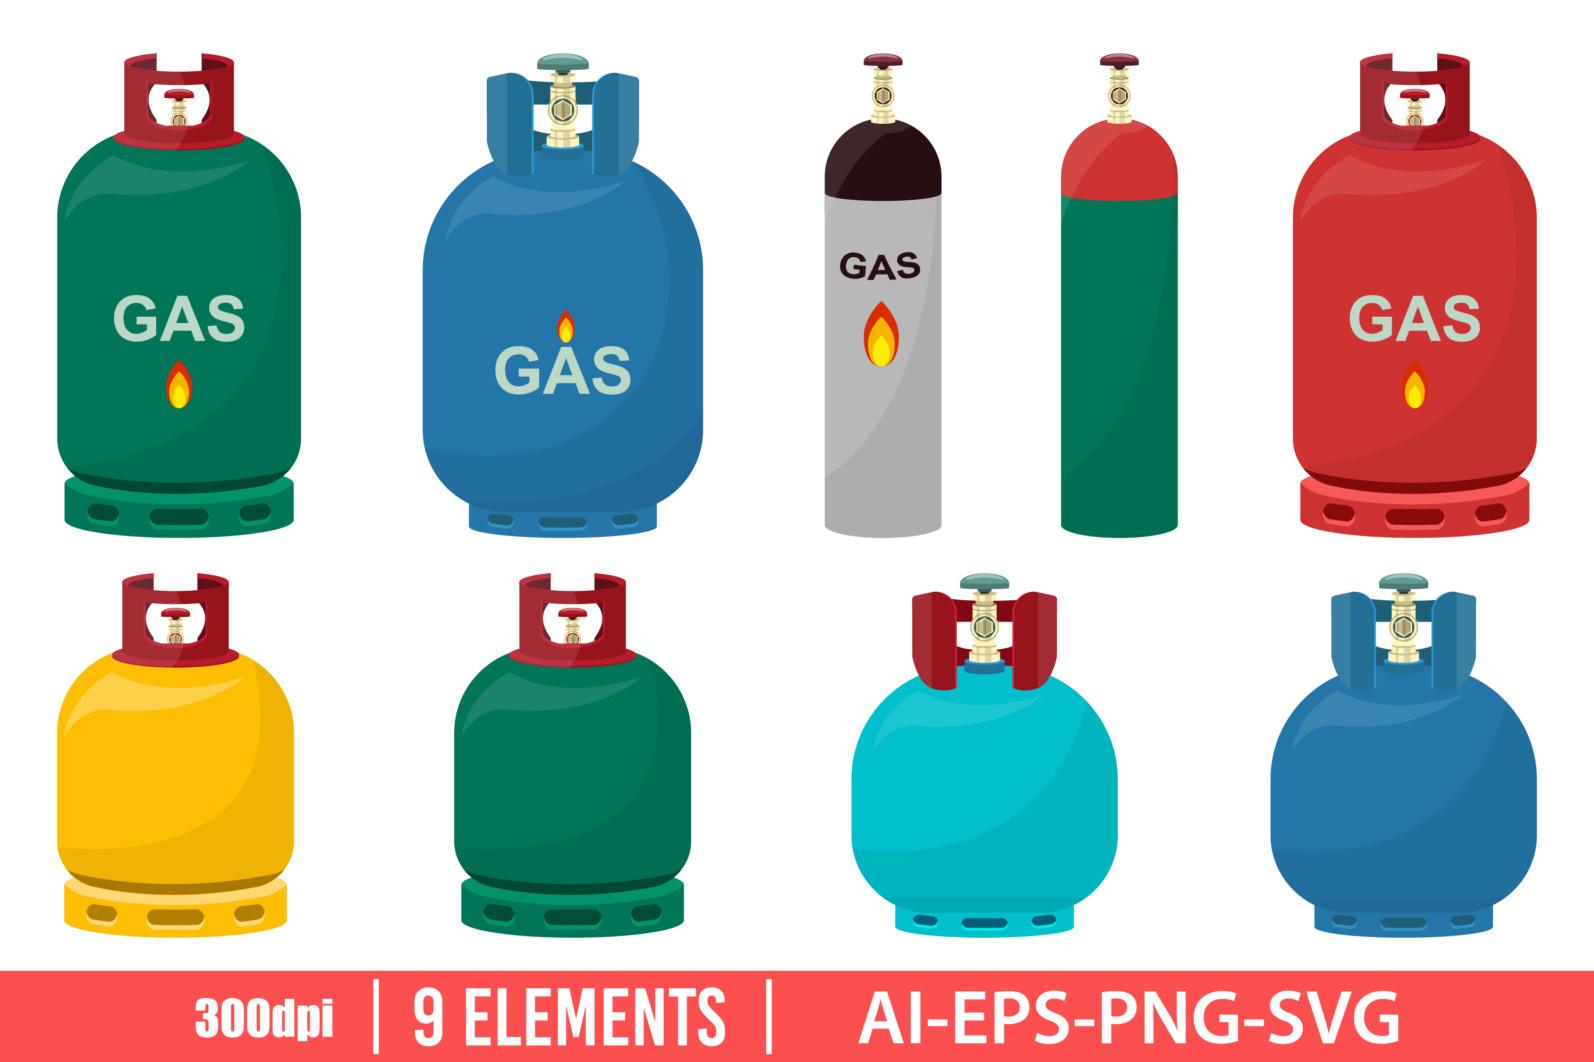 Gas tank clipart vector design illustration. Gas tank set. Vector Clipart Print - GAS TANK scaled -